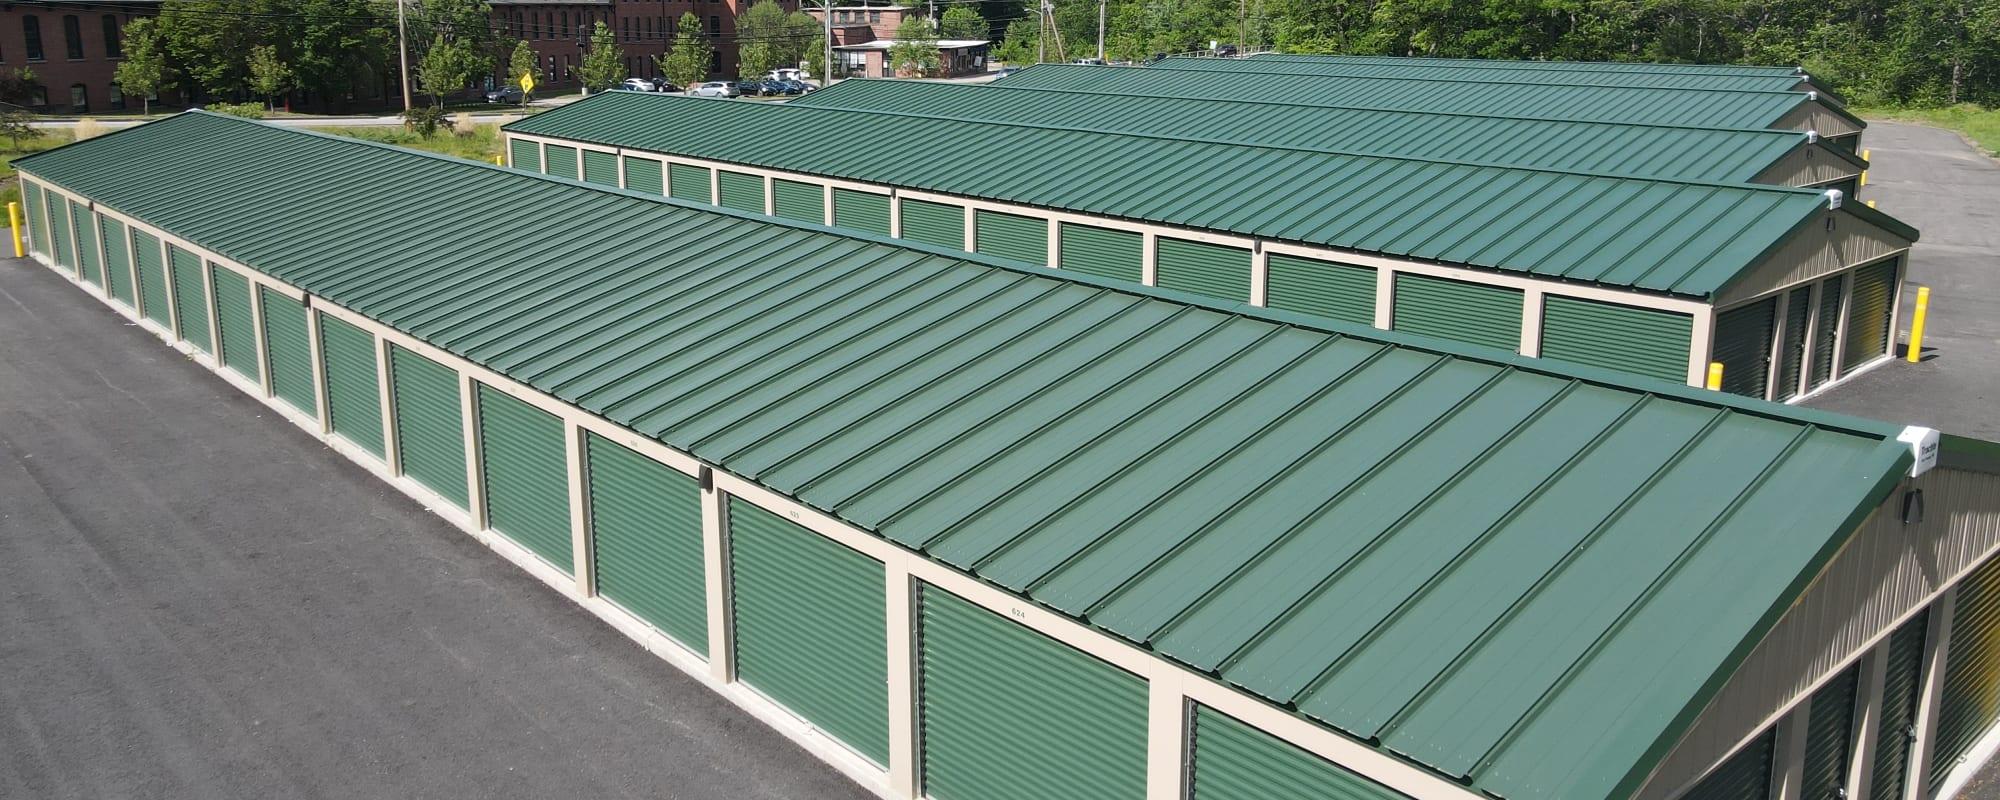 603 Storage - West Milford self storage in Milford, New Hampshire